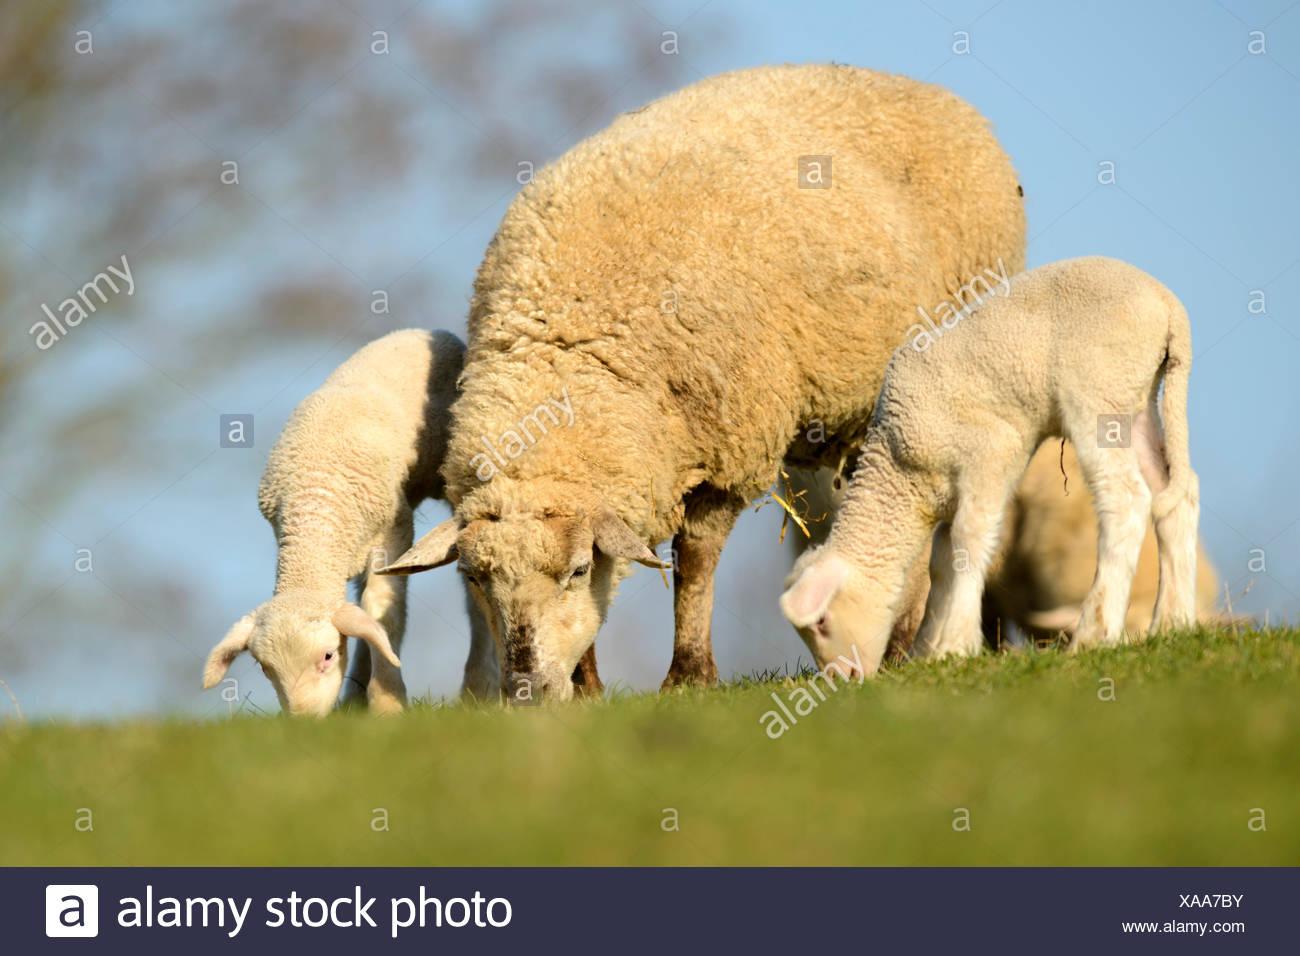 Merino Sheep, ewe with lambs - Stock Image